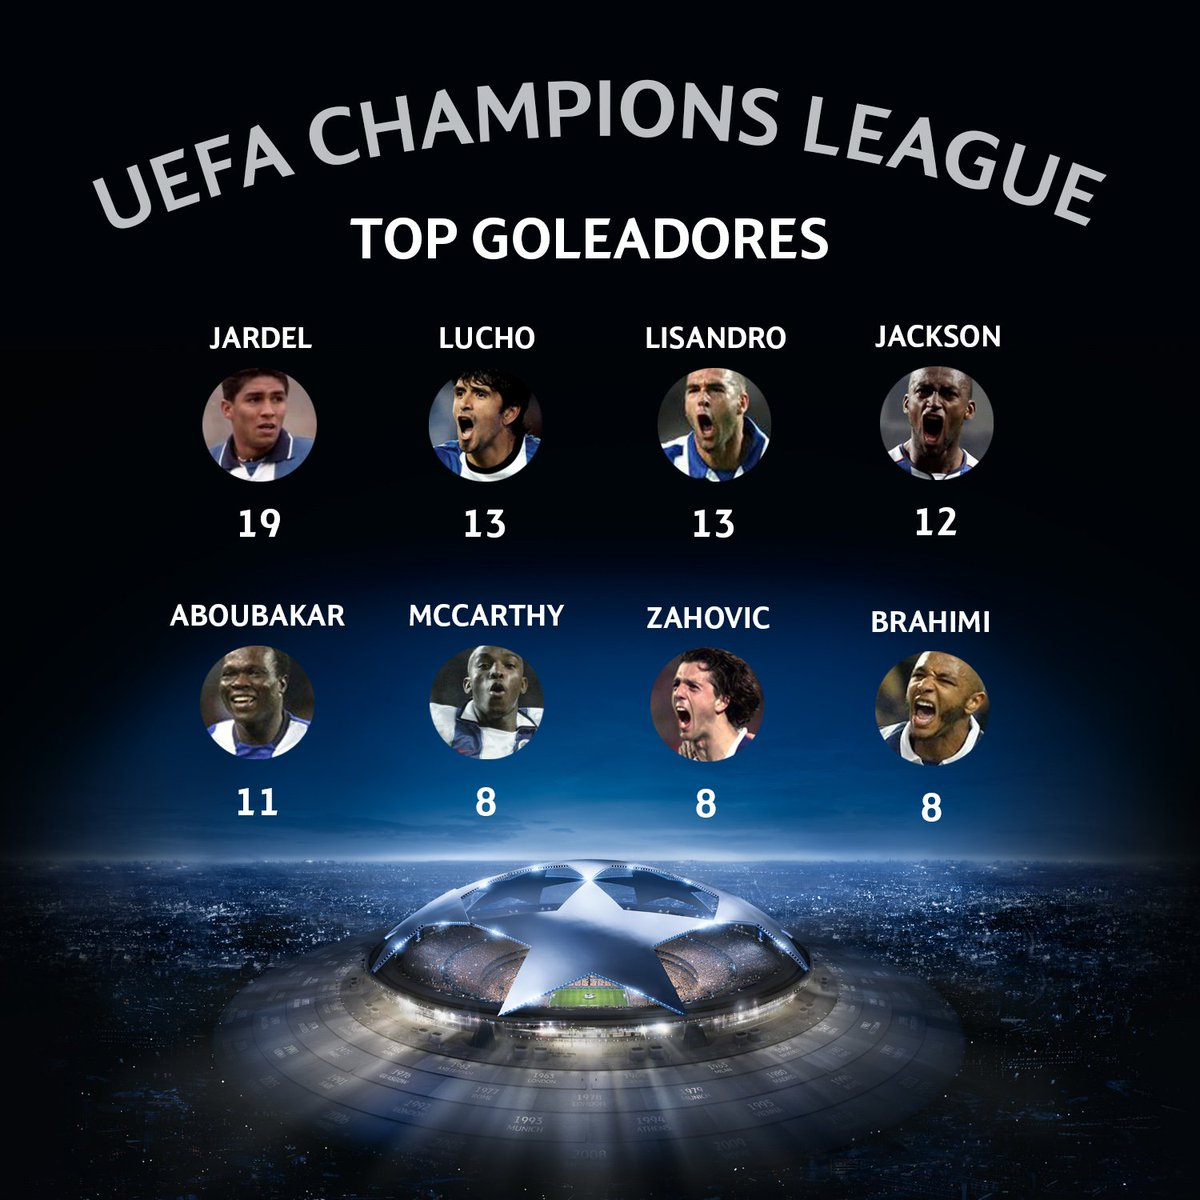 Aboubakar e Brahimi continuam a subir posições no top de goleadores #FCPorto na @ChampionsLeague   #FCPASM #UCL